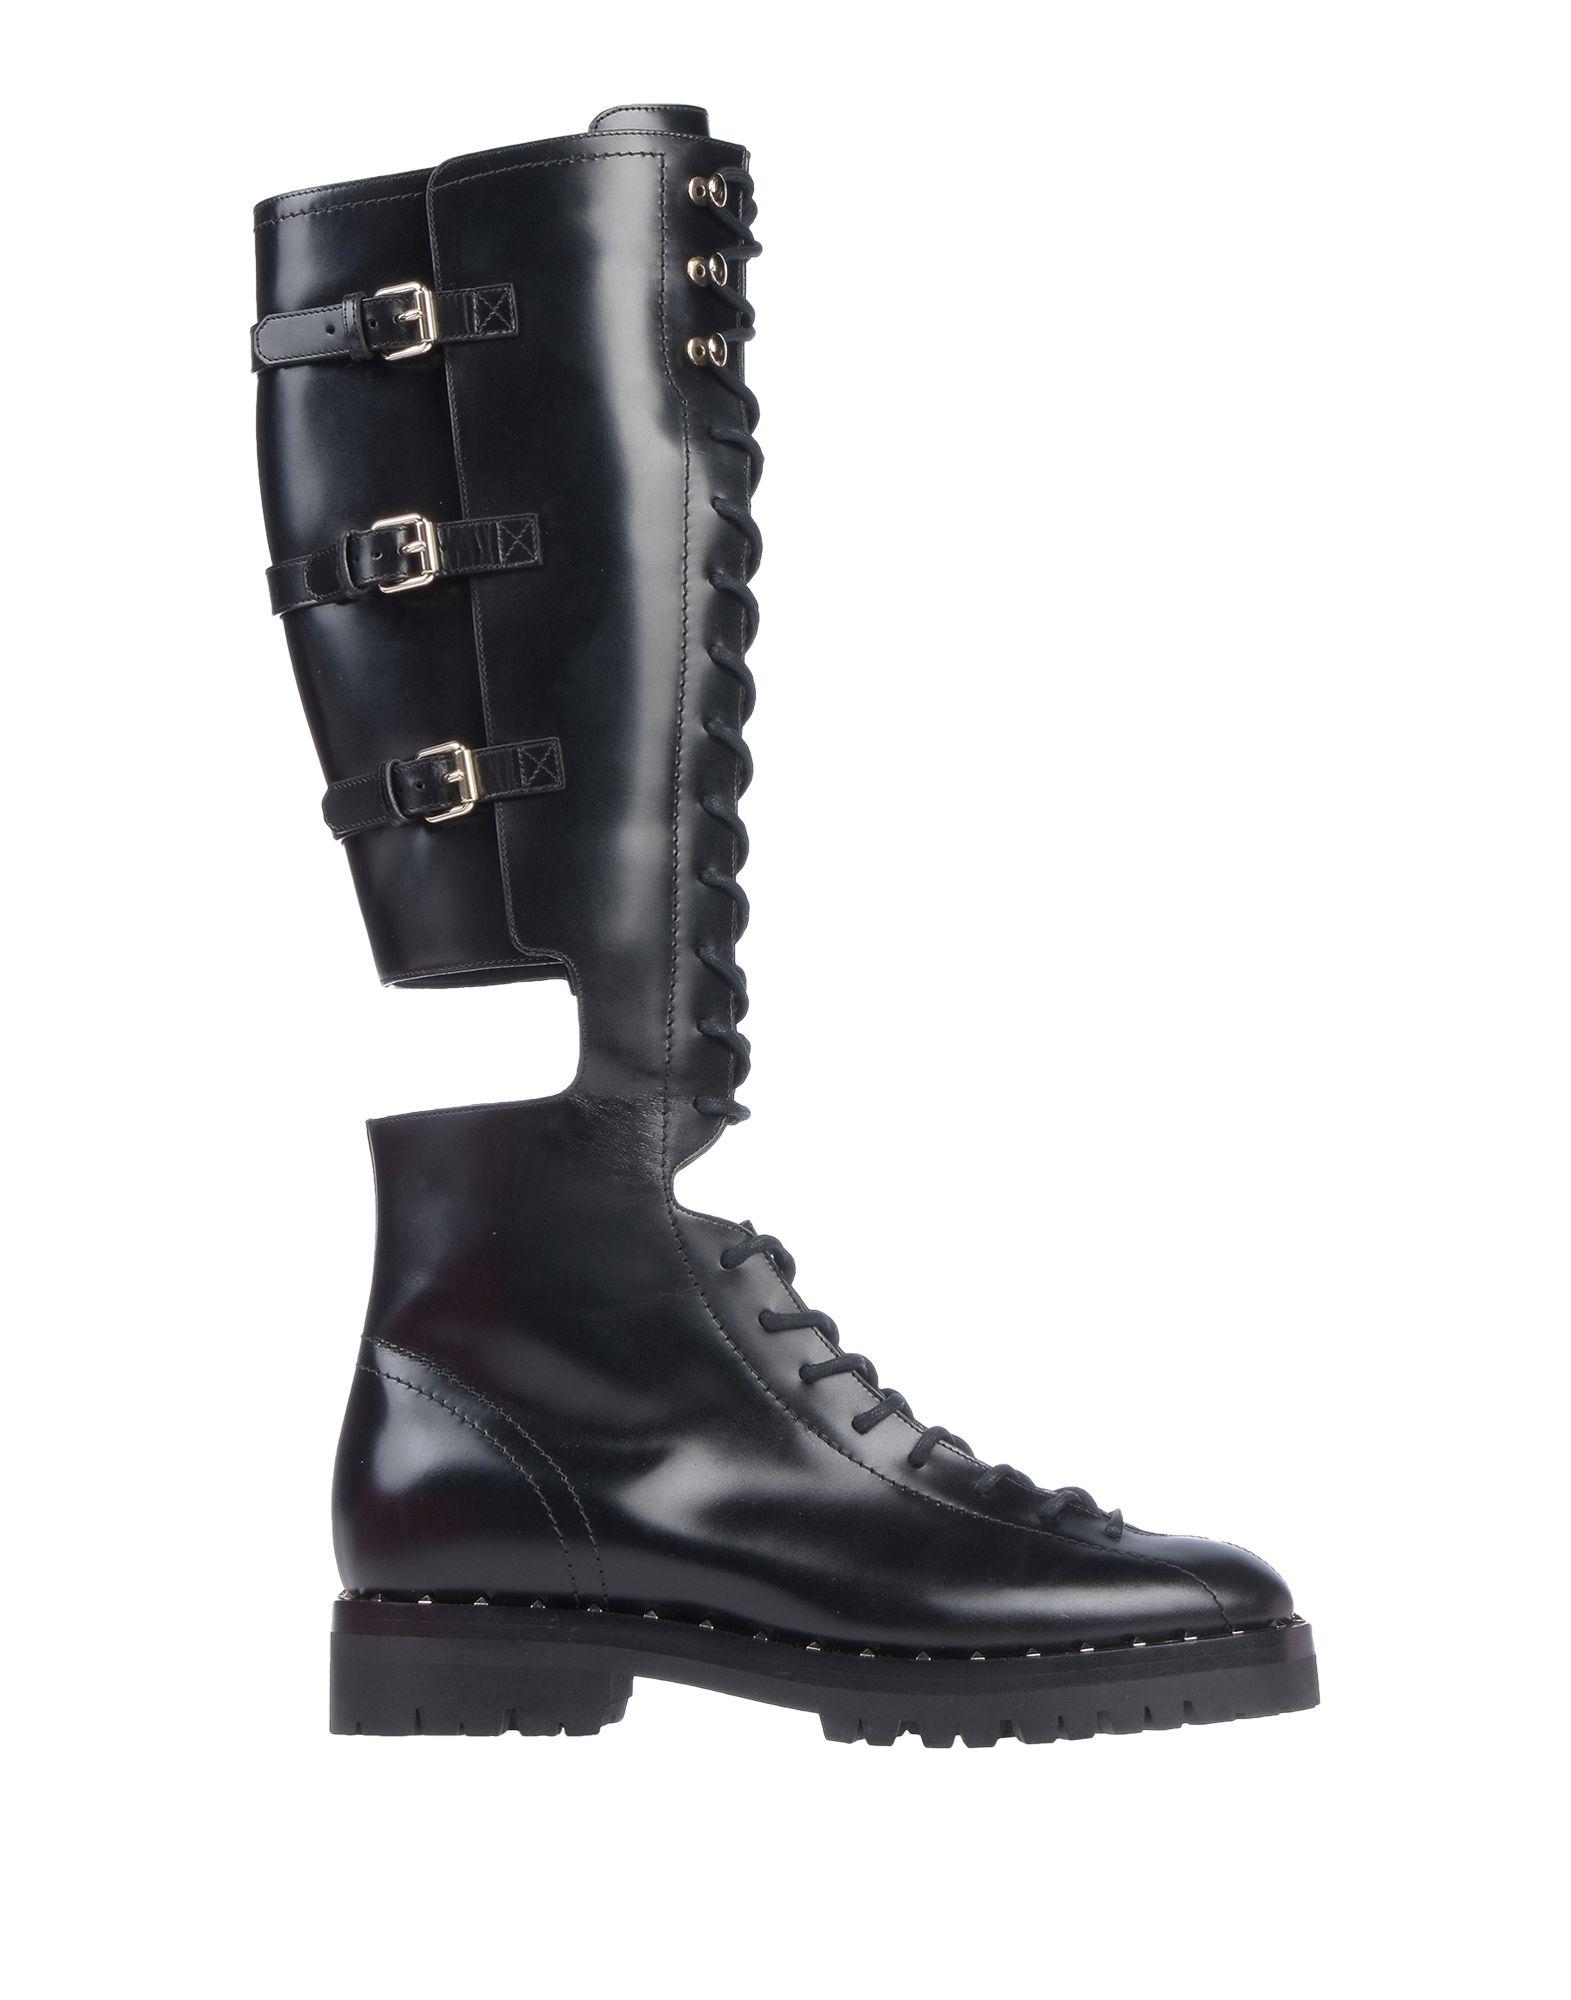 Stiefel Valentino Garavani damen - 11482064OL